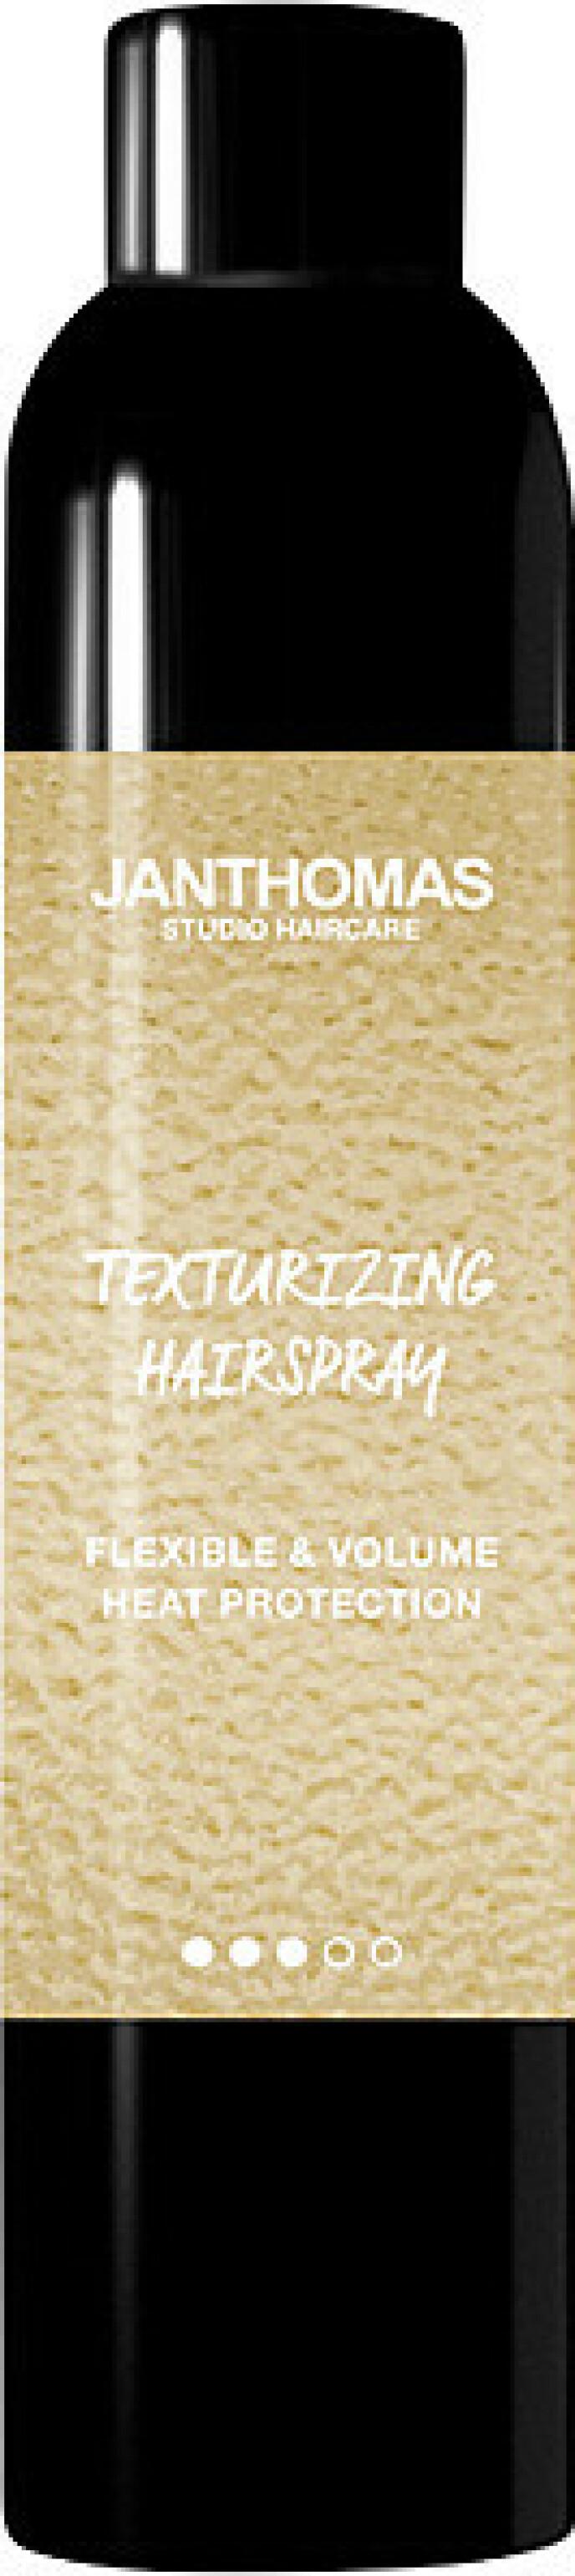 Texturizing Hair Spray (kr 139, Jan Thomas Studio). FOTO: Produsenten